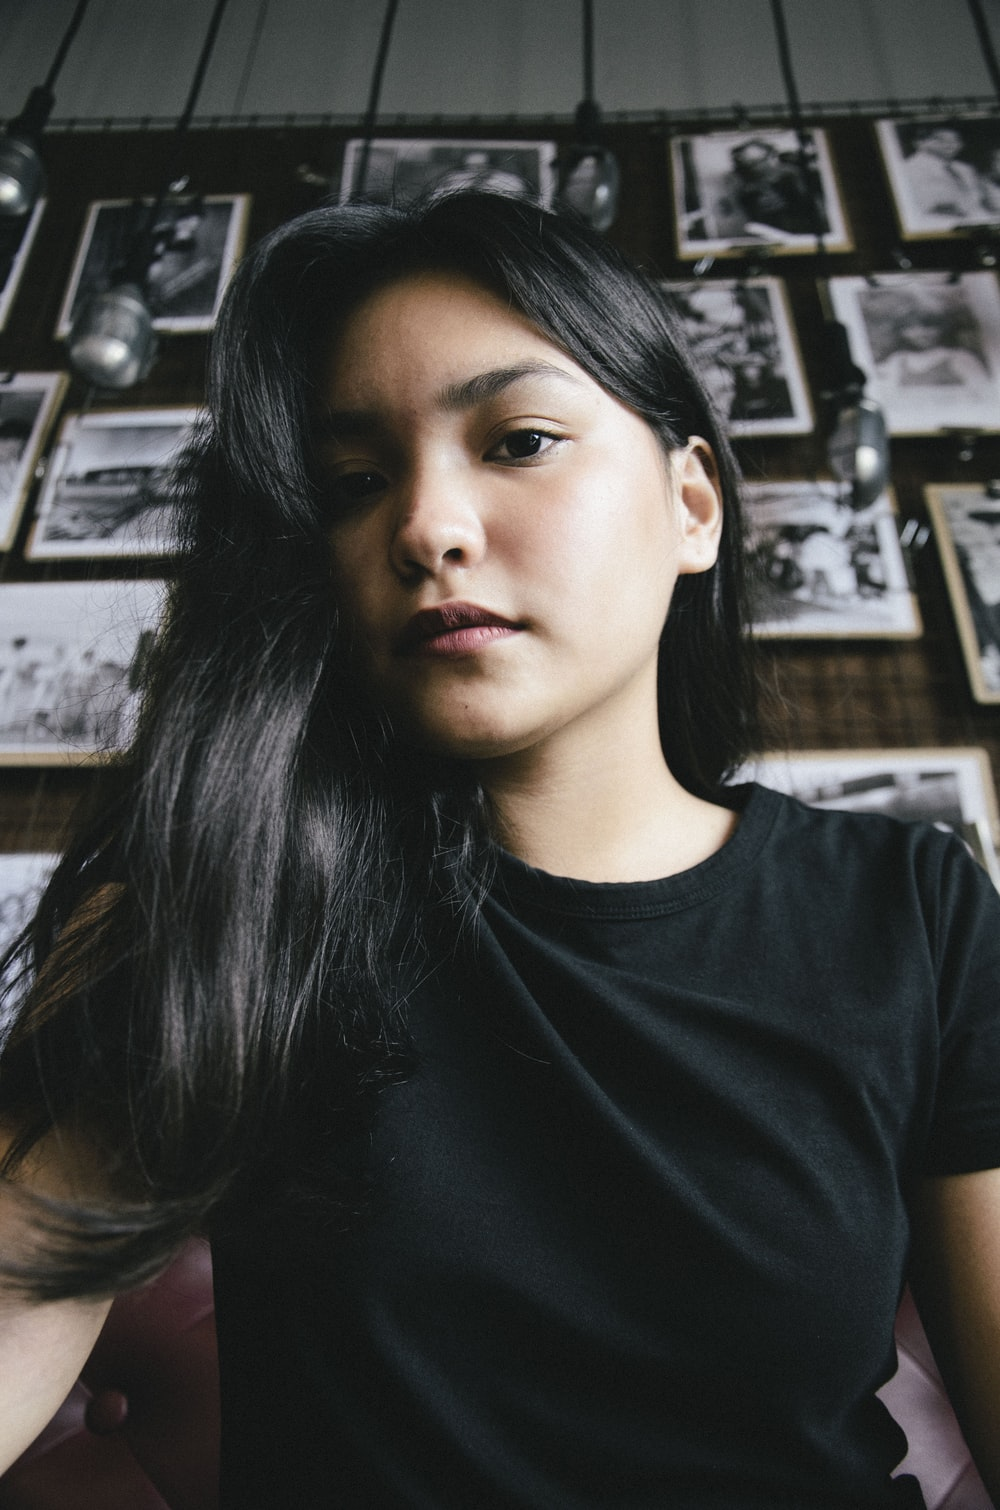 woman wearing black shirt